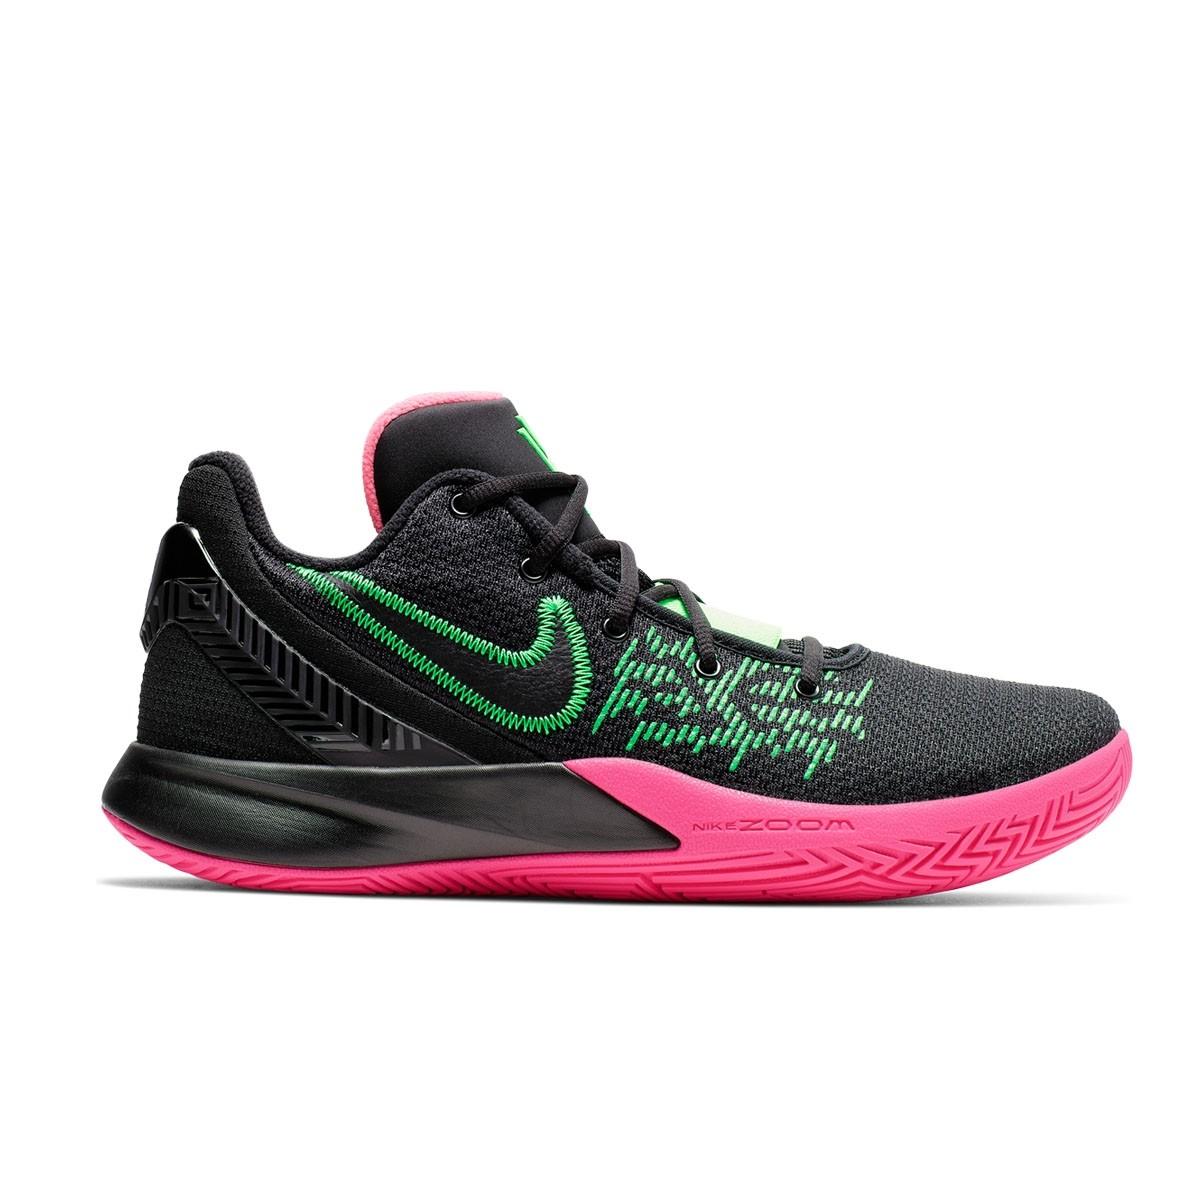 Nike Kyrie Flytrap II \u0027Hyper Pink\u0027